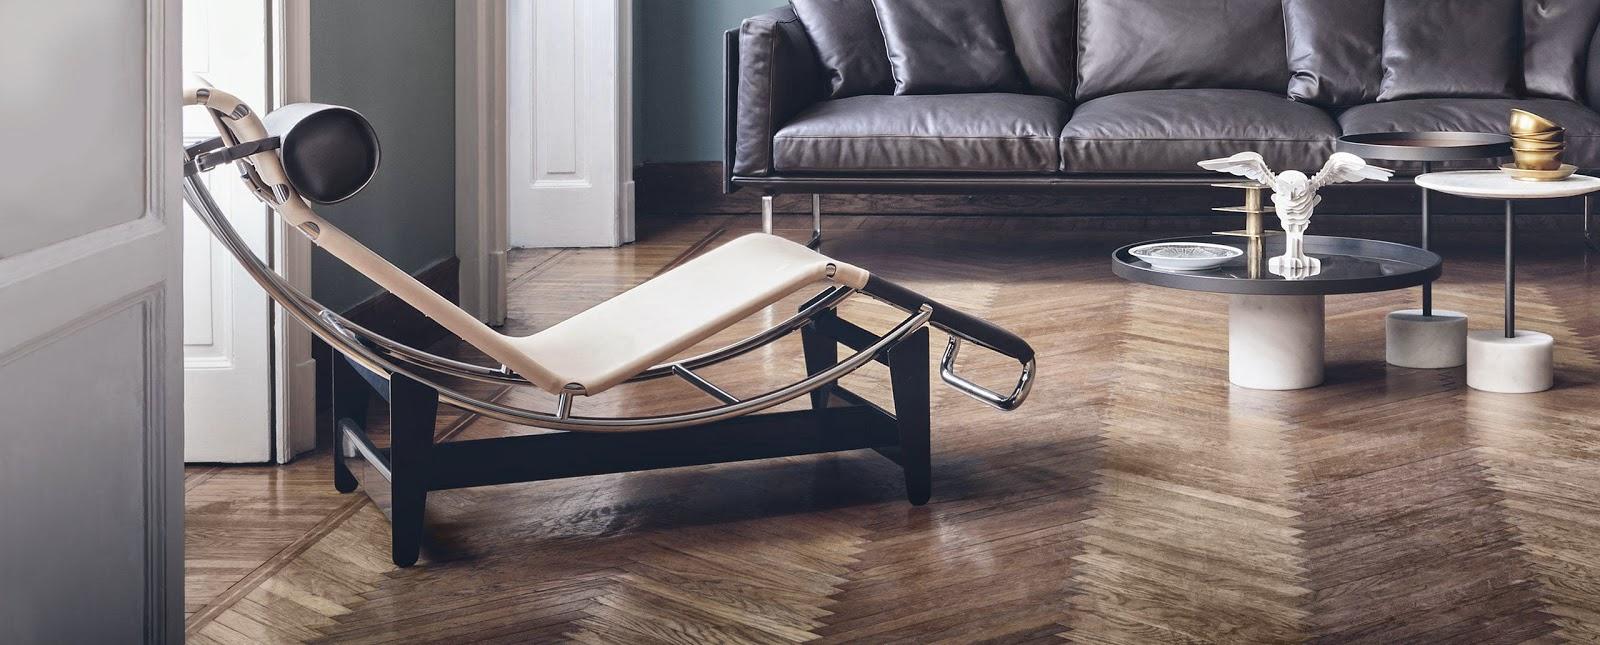 Deliving design craft wedeco pasa palabra - Fauteuil le corbusier lc4 ...